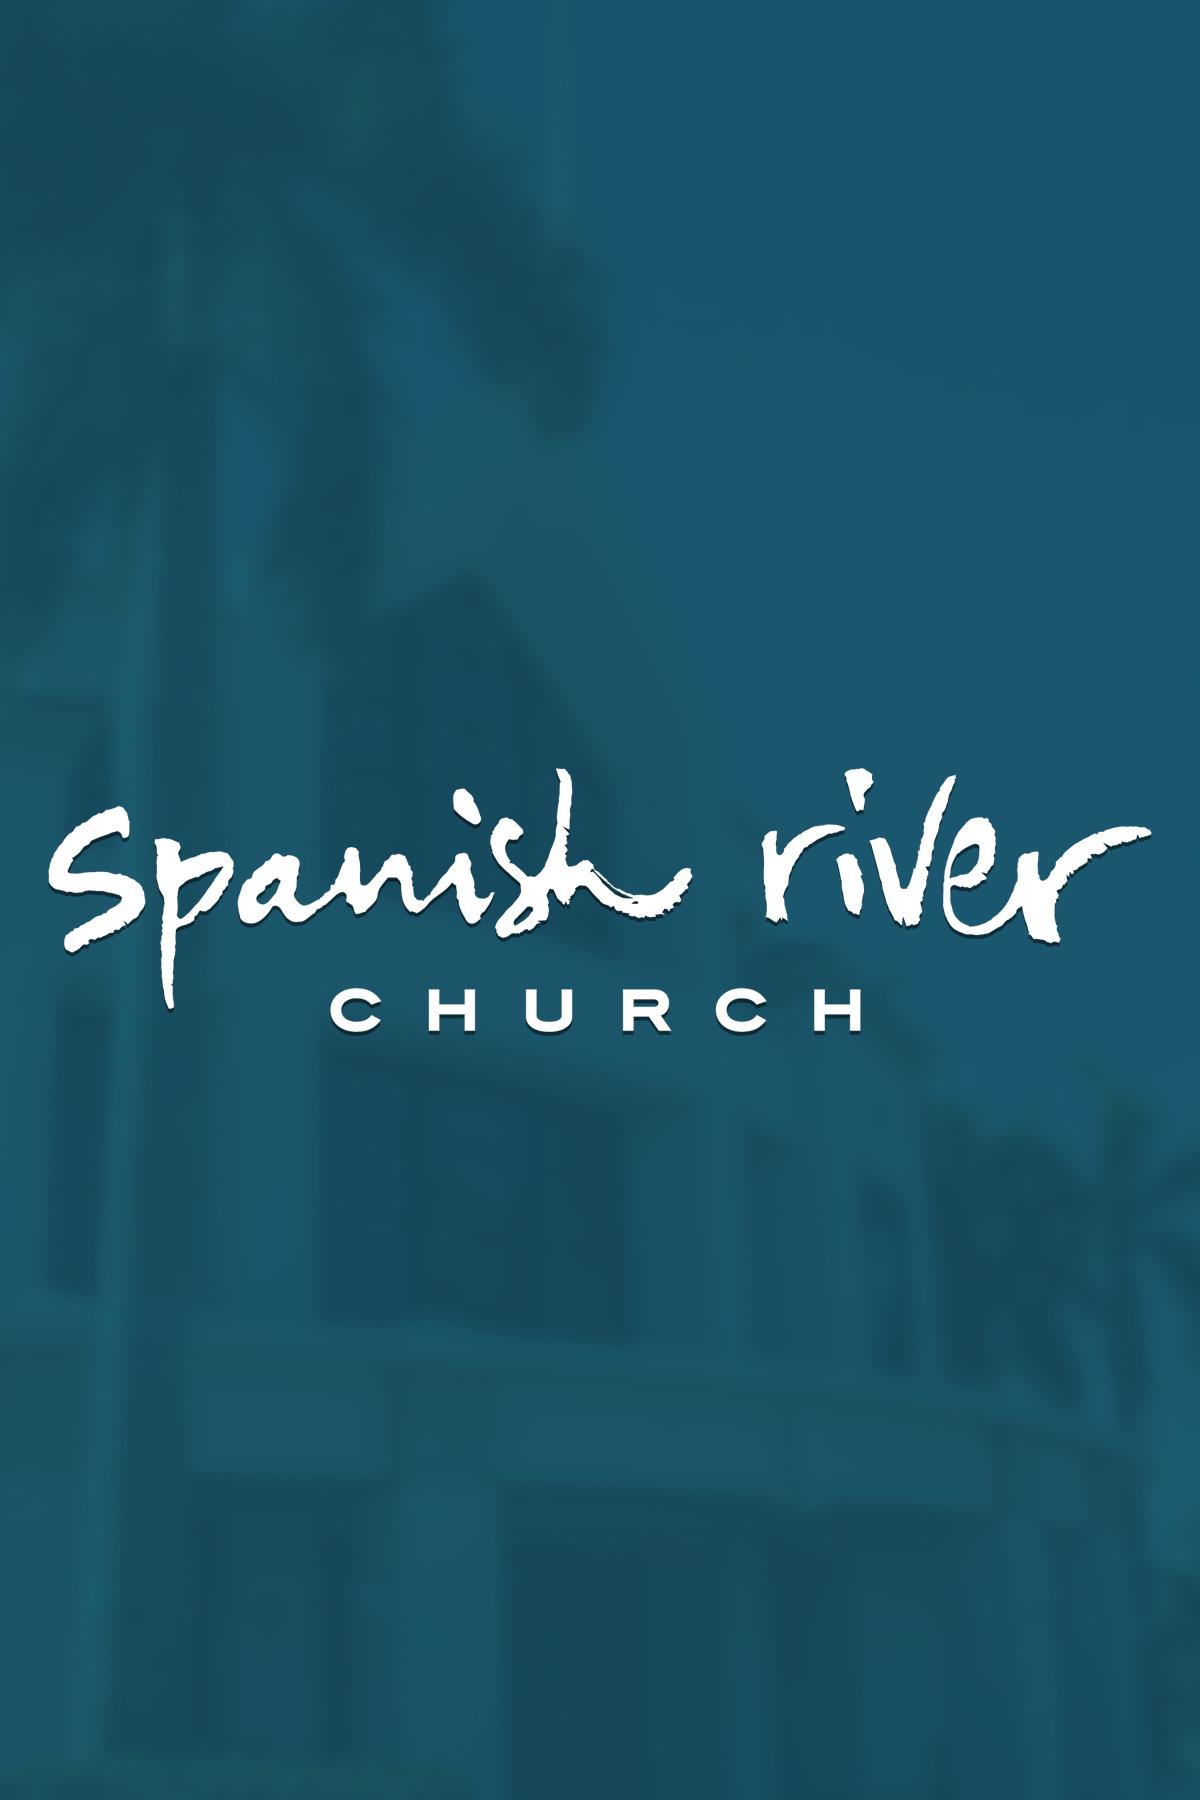 spanish river church services on livestream